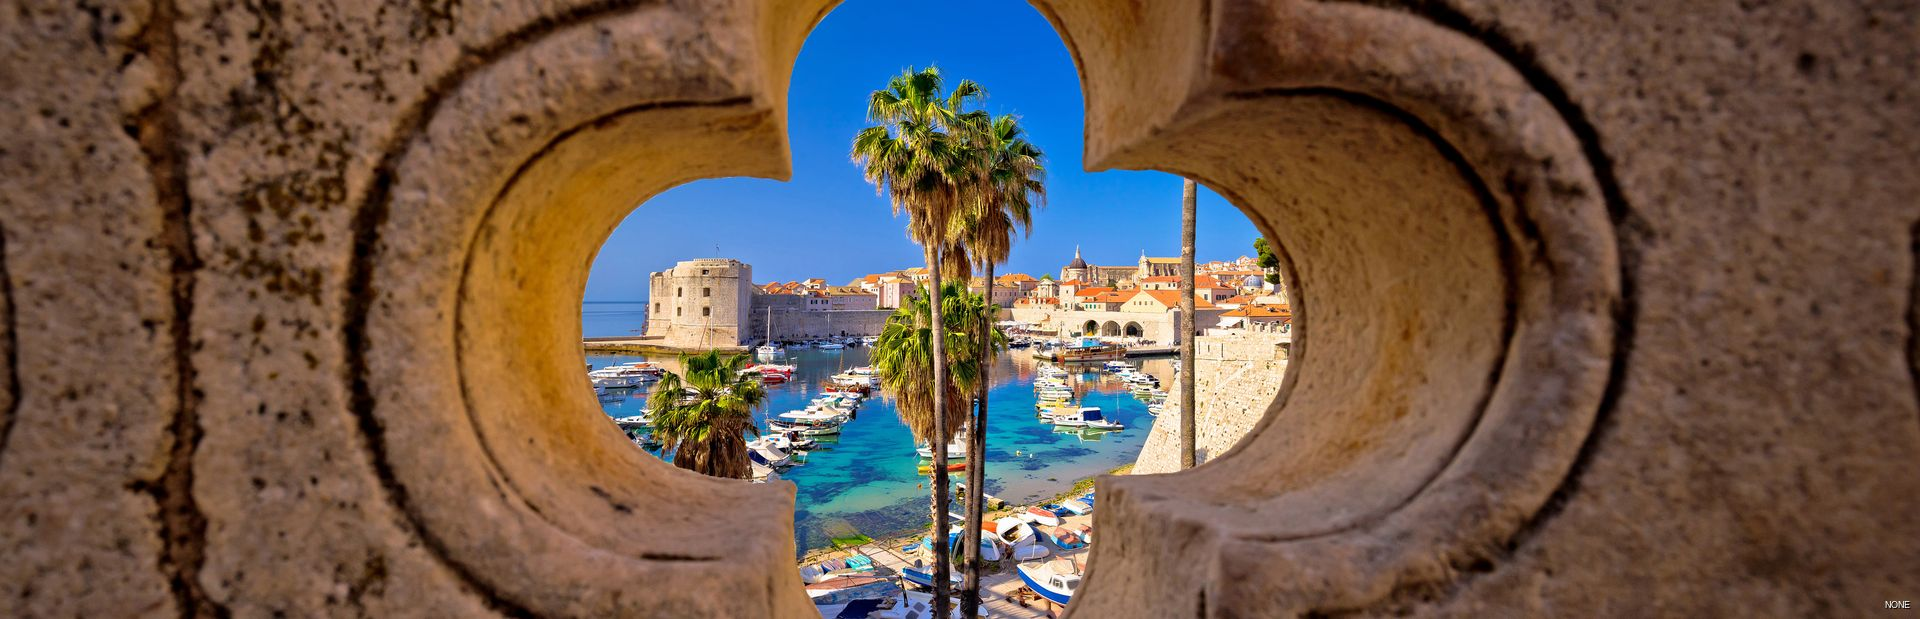 Dubrovnik inspiration and tips